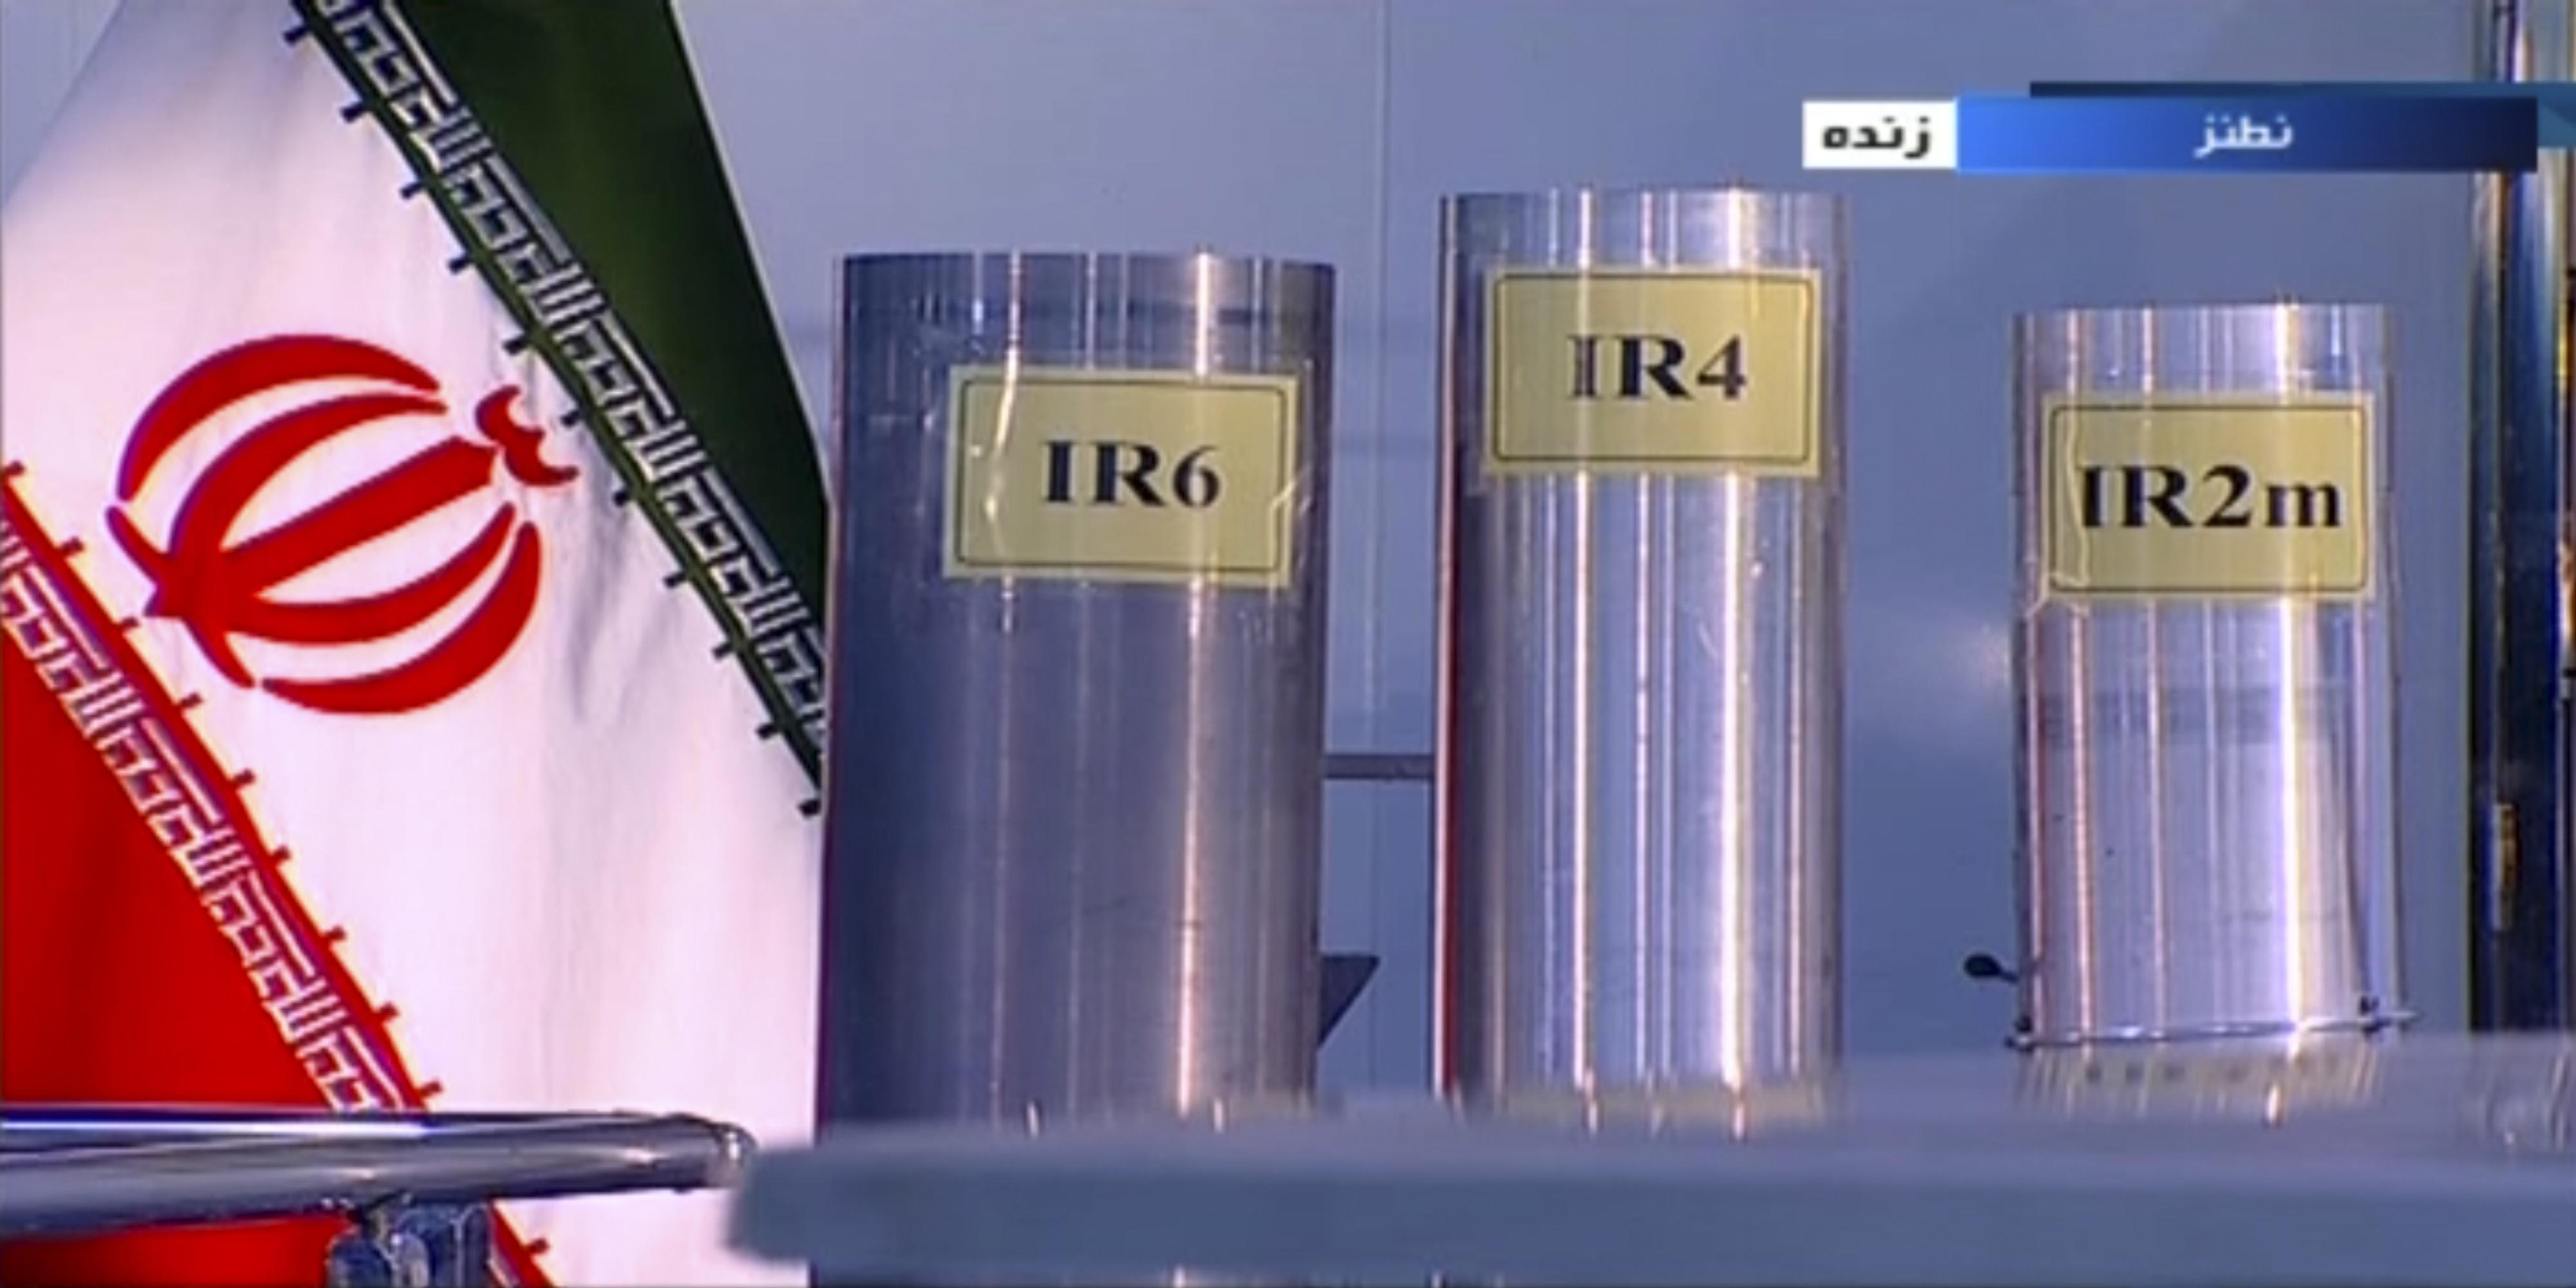 Iran's anniversary provocation